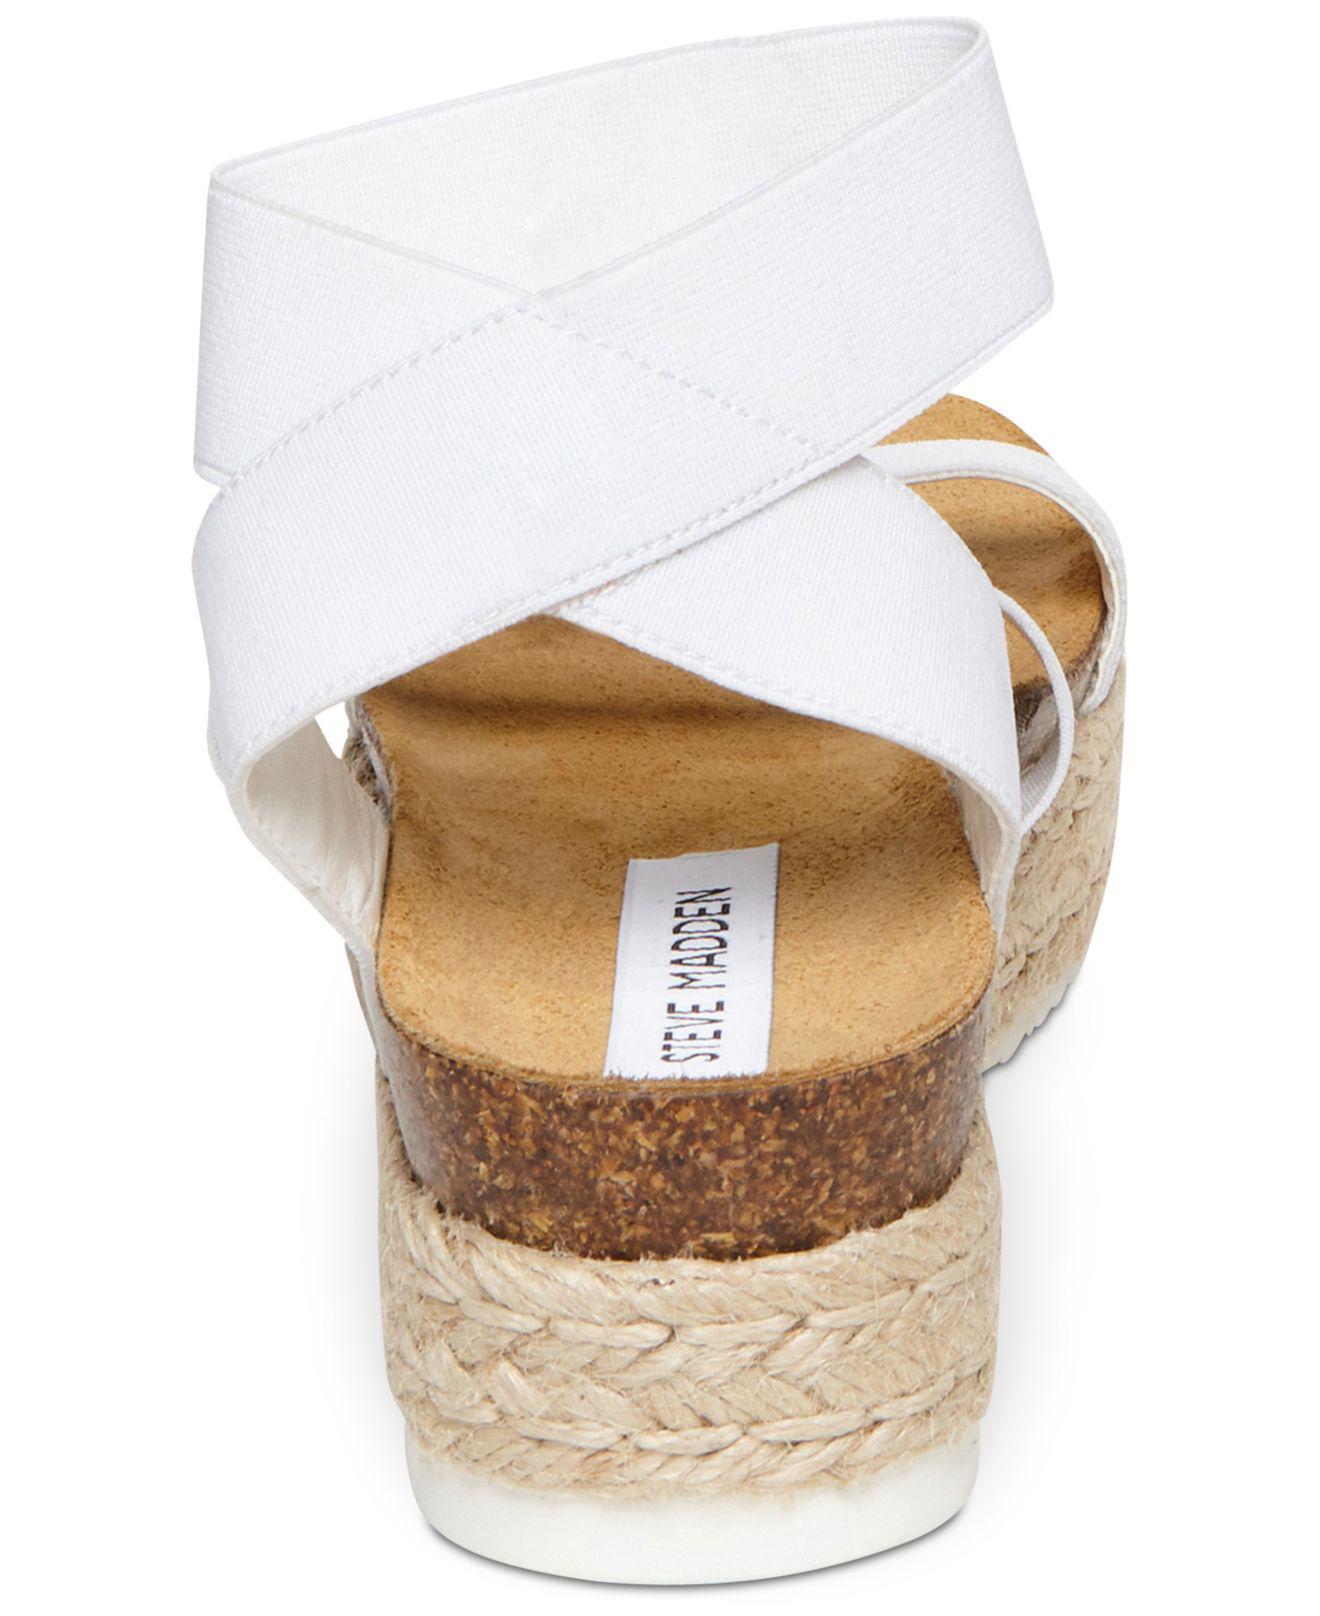 d1e2c97a2ad Women's White Kimmie Flatform Espadrille Sandals